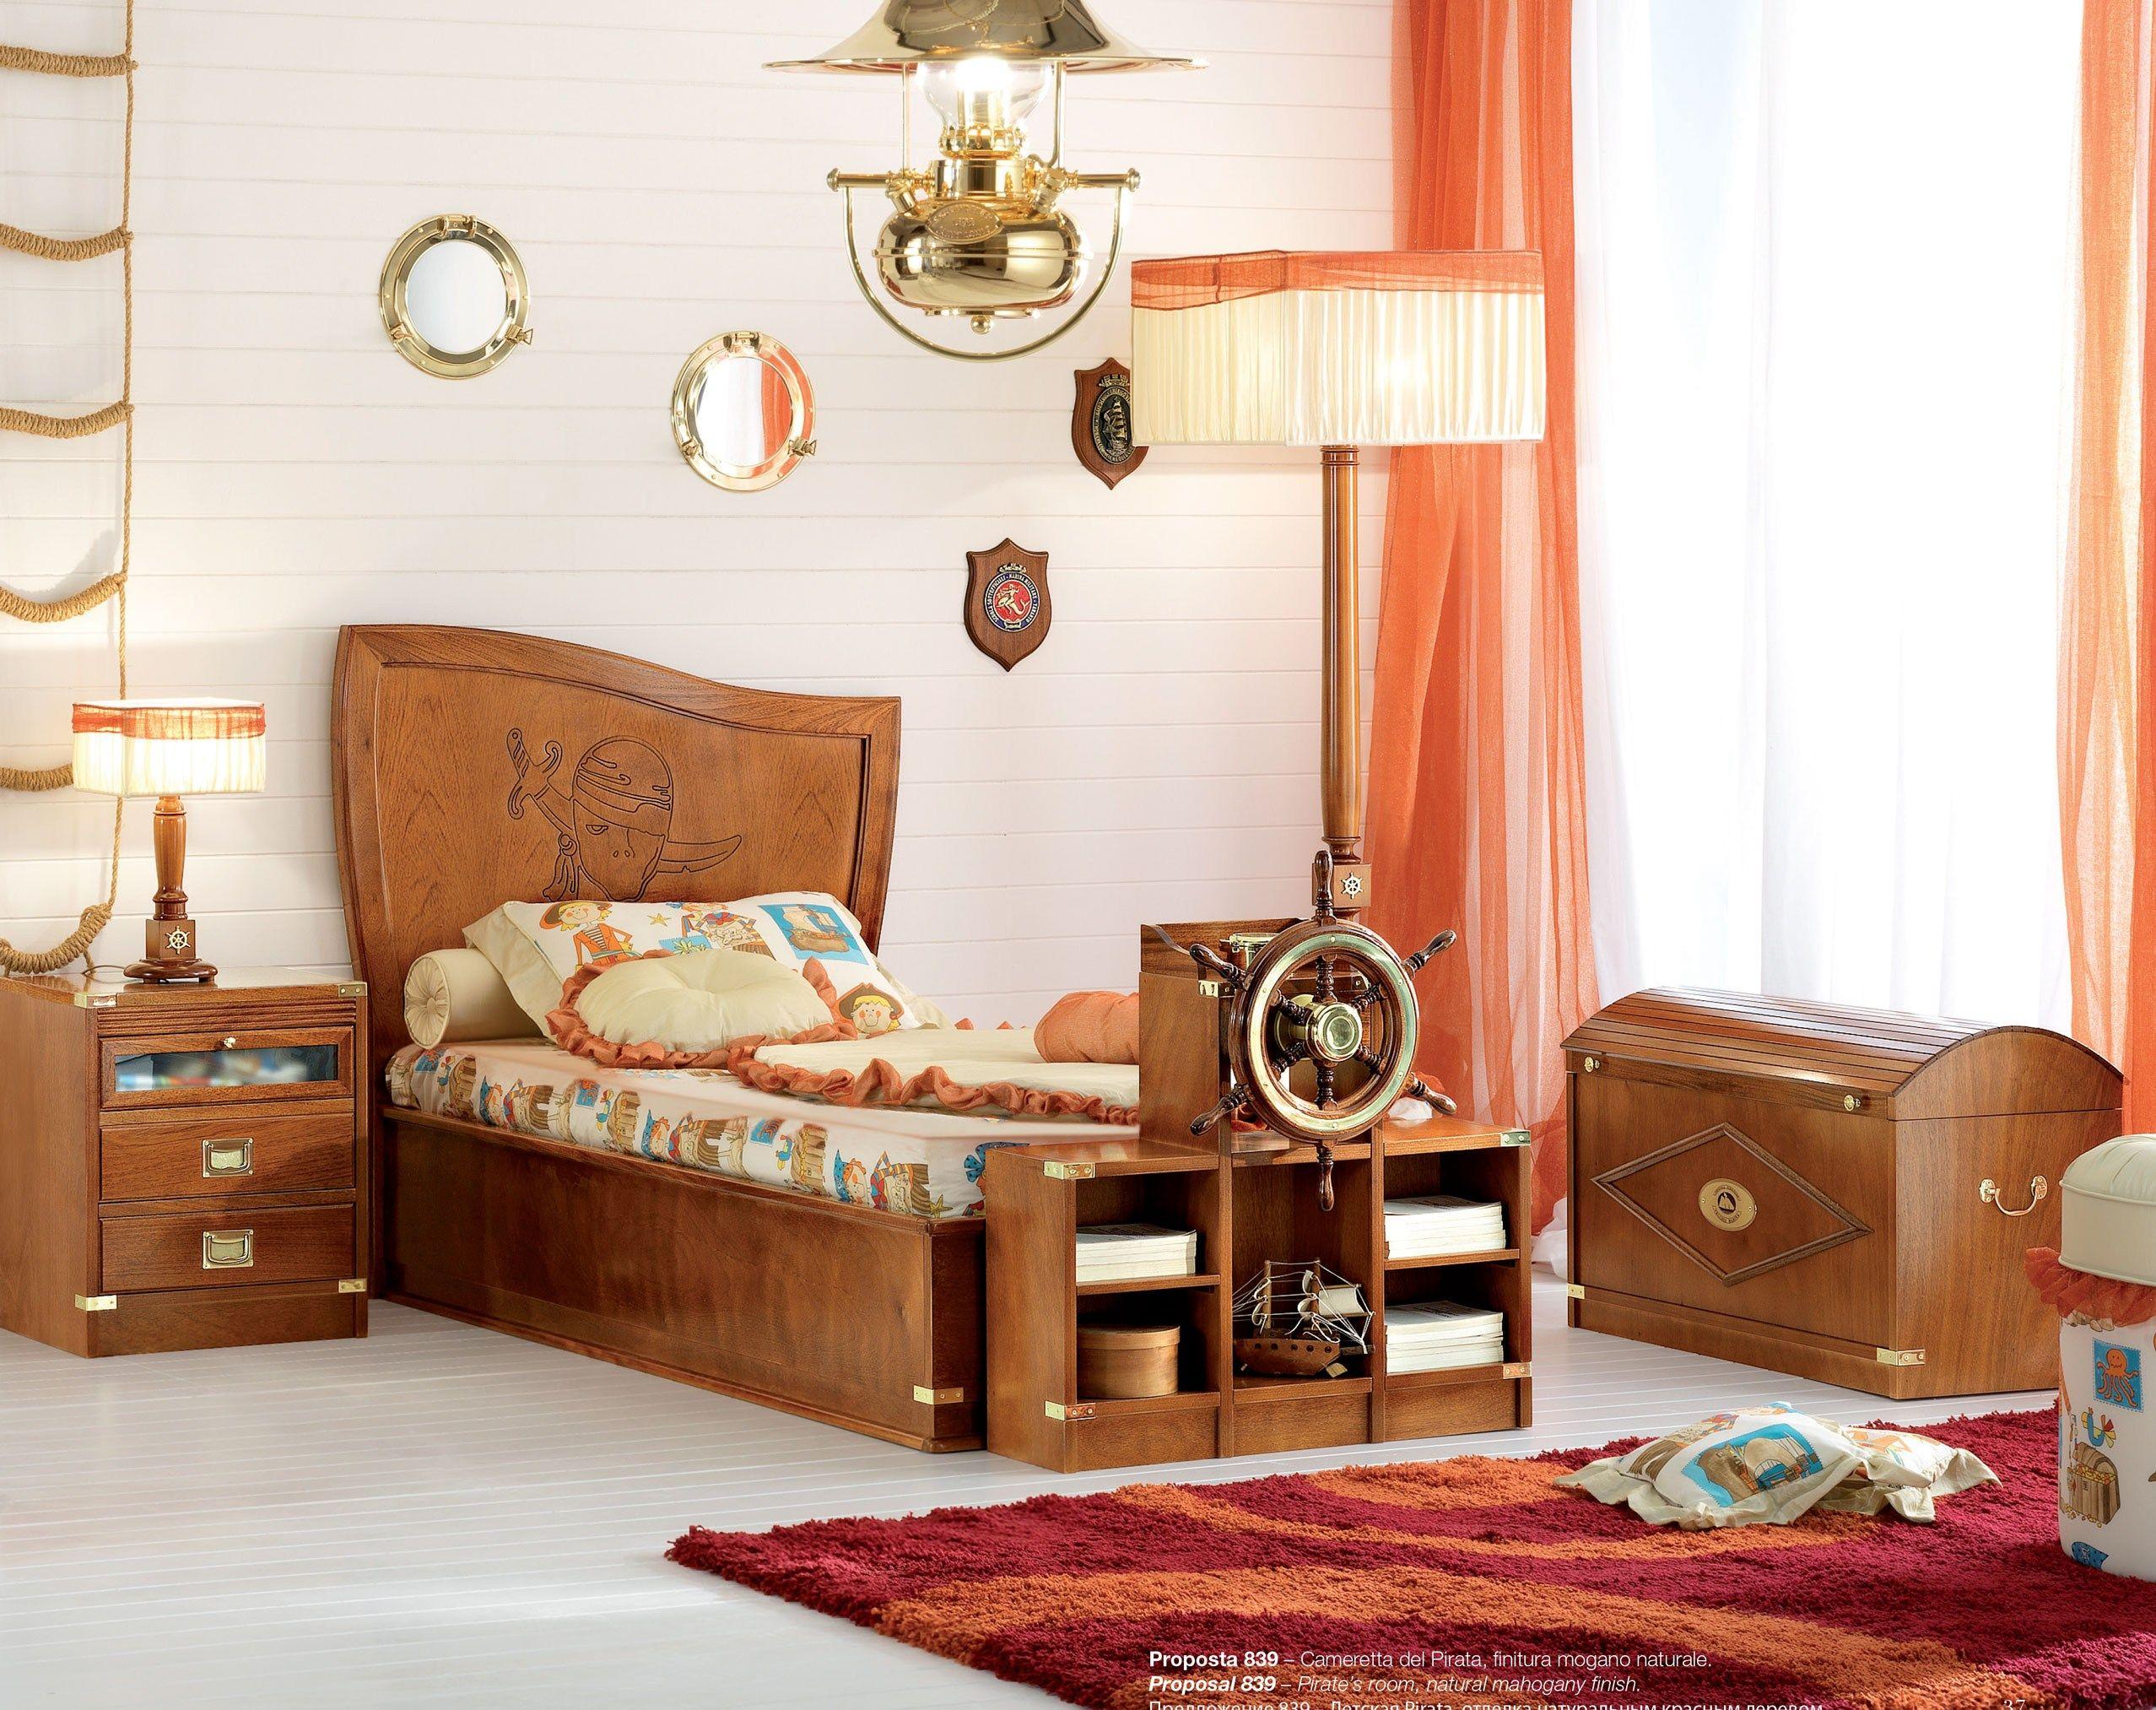 Cama tapizada de madera de estilo tradicional con cabecera - Cabeceras de cama de madera ...